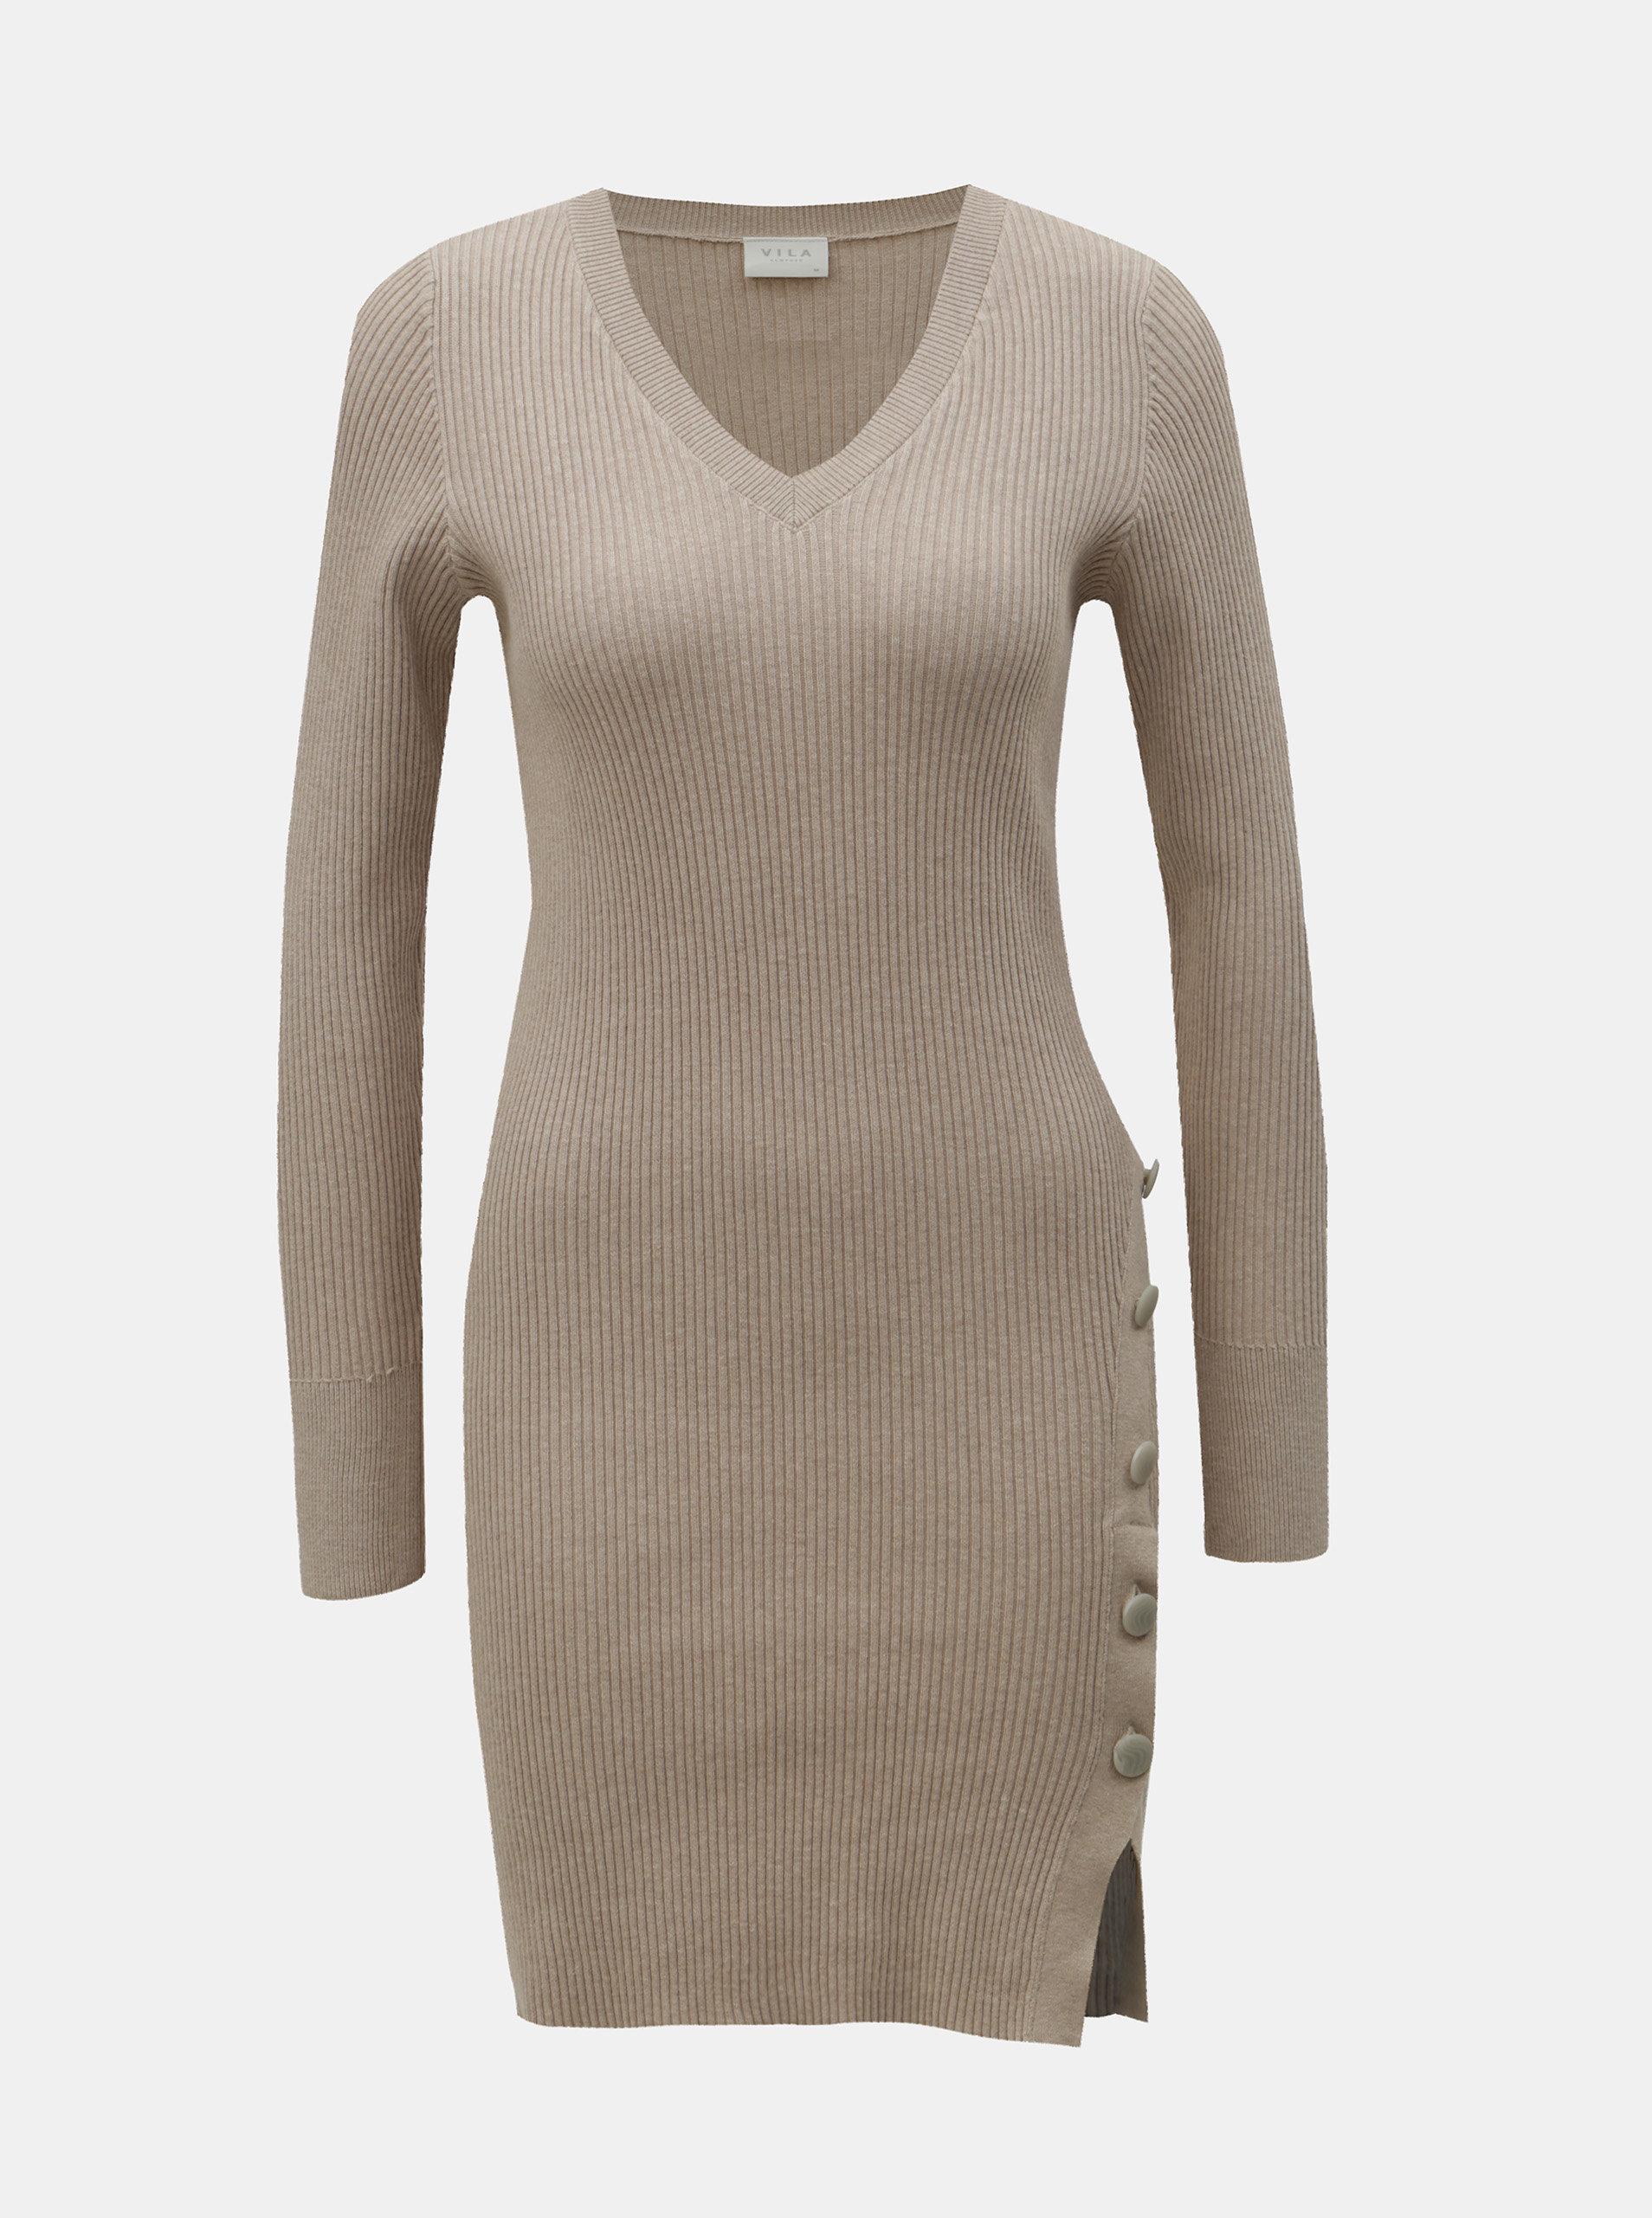 d6462c9cf71f Béžové žebrované svetrové šaty s knoflíky VILA Soldana ...